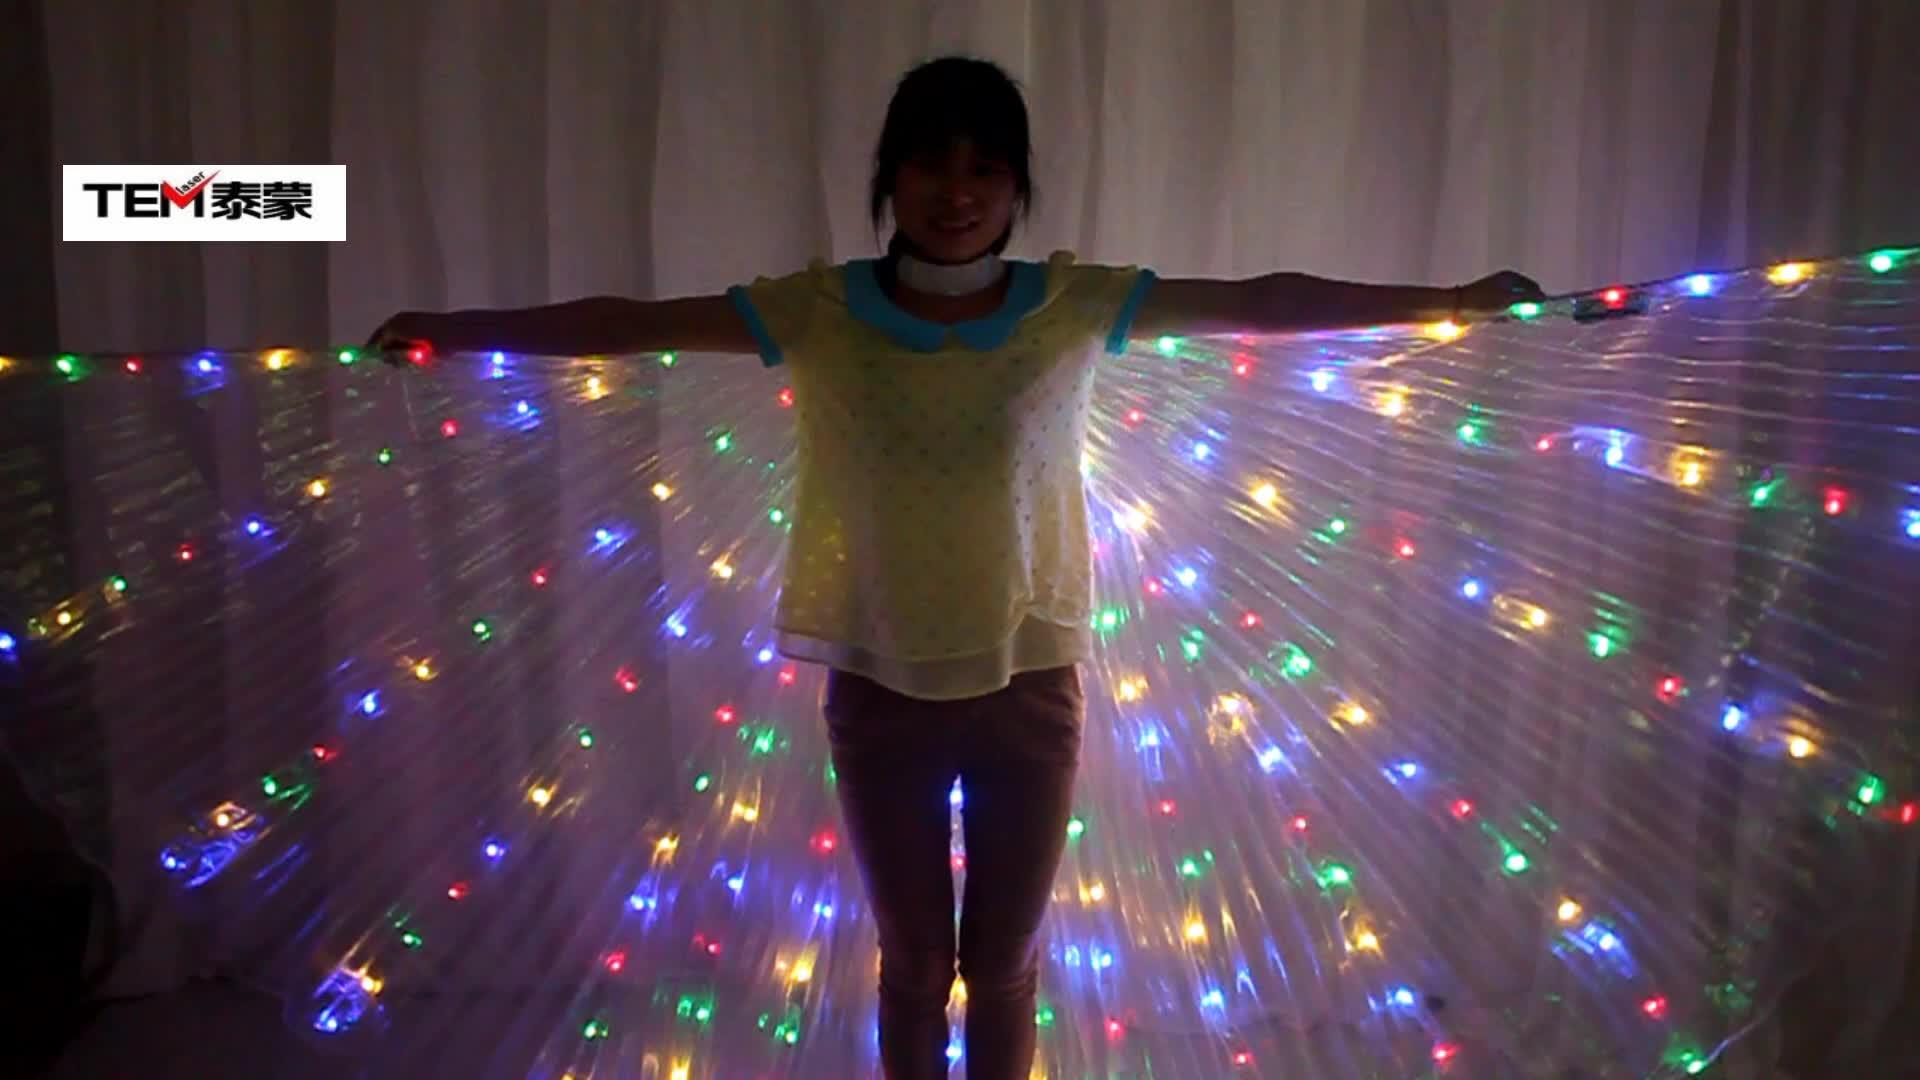 Ledベリーbancing lsis翼dj翼女の子ダンス衣装ライトアップ翼セットダンスアクセサリーハロウィン